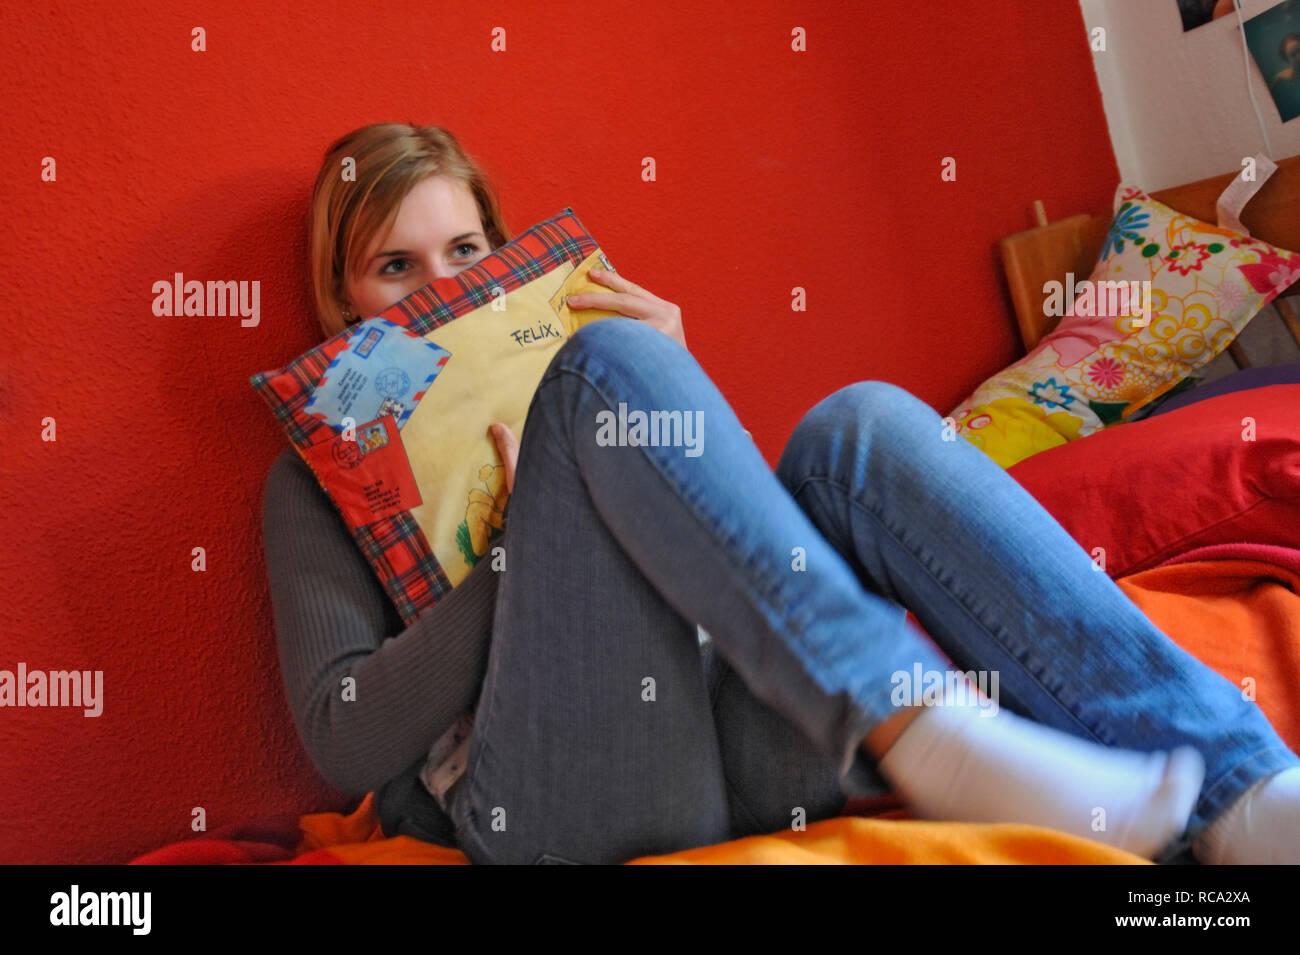 jugendliches Mädchen verträumt in ihrem Zimmer | young female teenager in a dreamy mood in her room Stock Photo